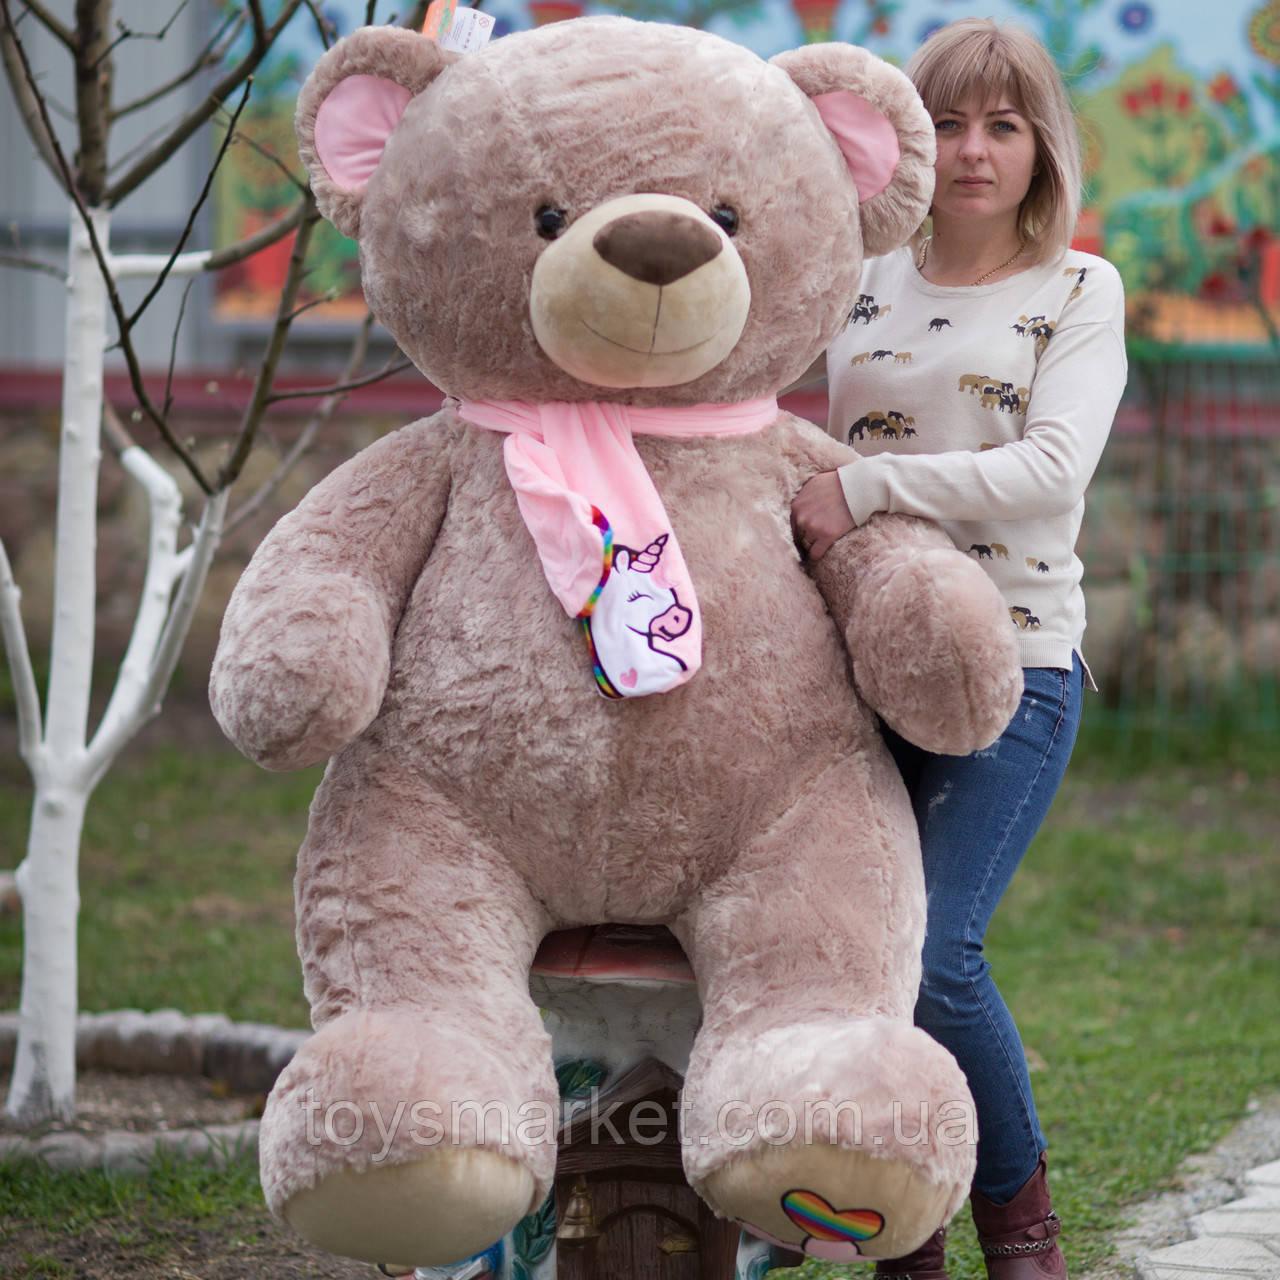 "Плюшевий ведмедик ""Тоша"", велика м'яка іграшка ведмідь 150 см, плюшева іграшка ведмідь"